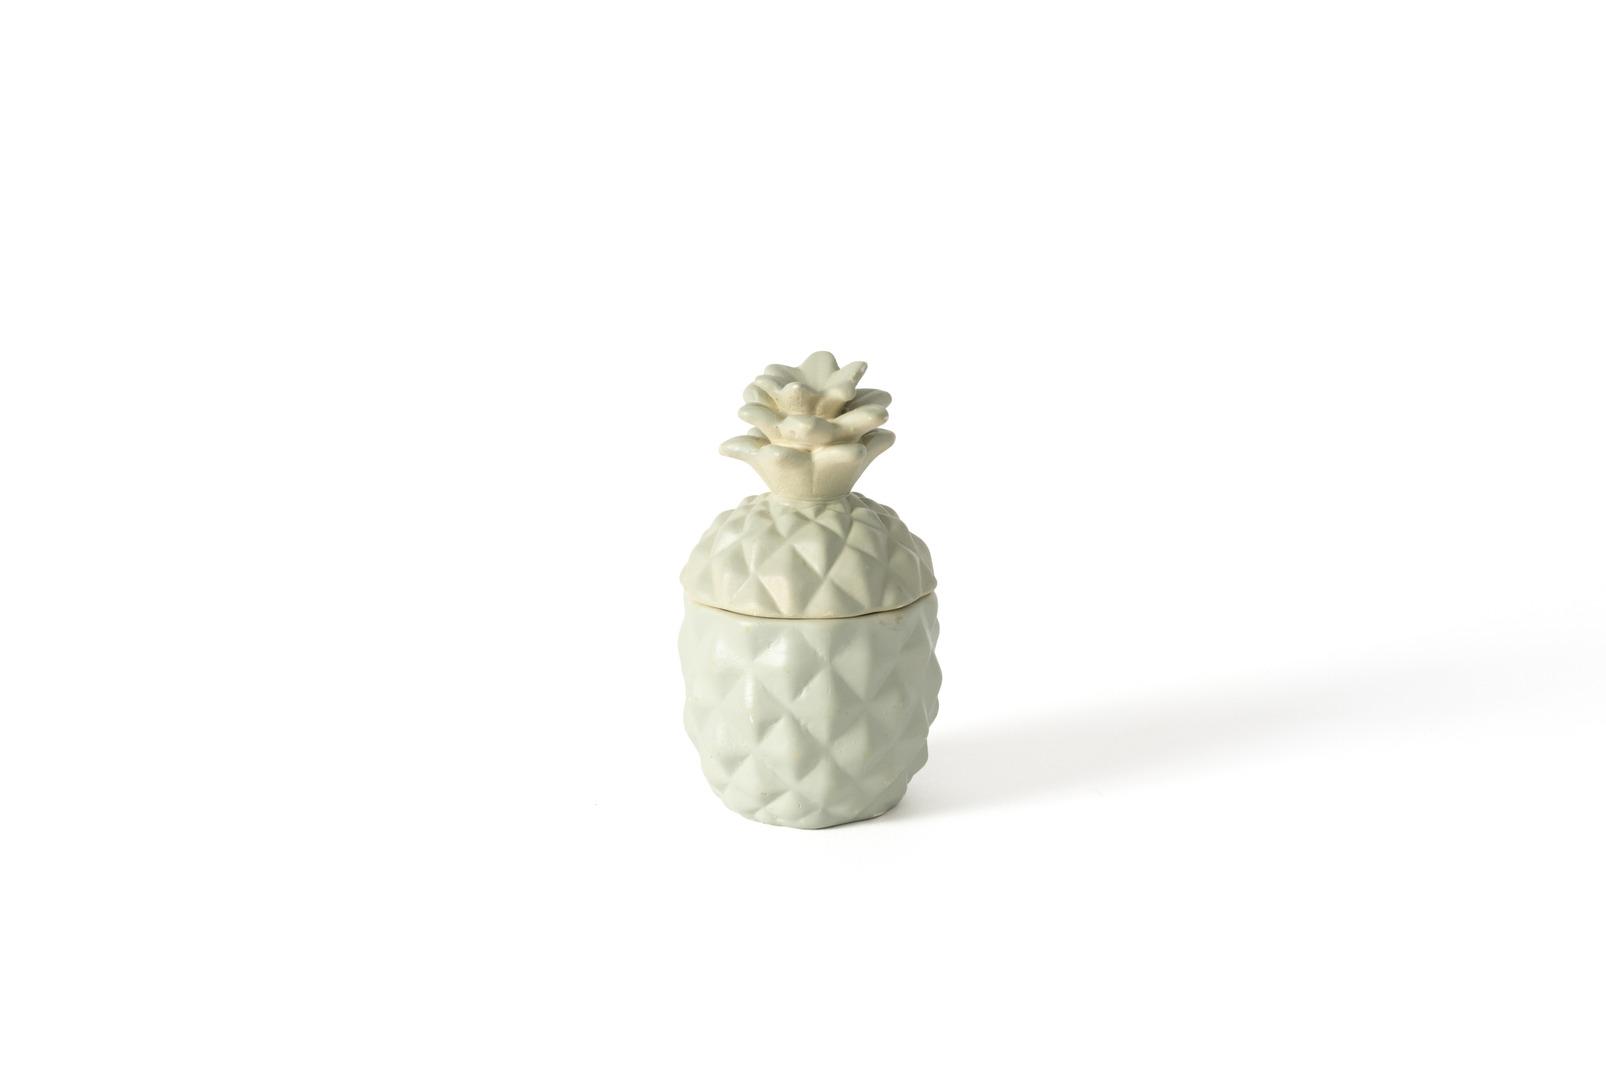 Ceramic box in the shape of pineapple